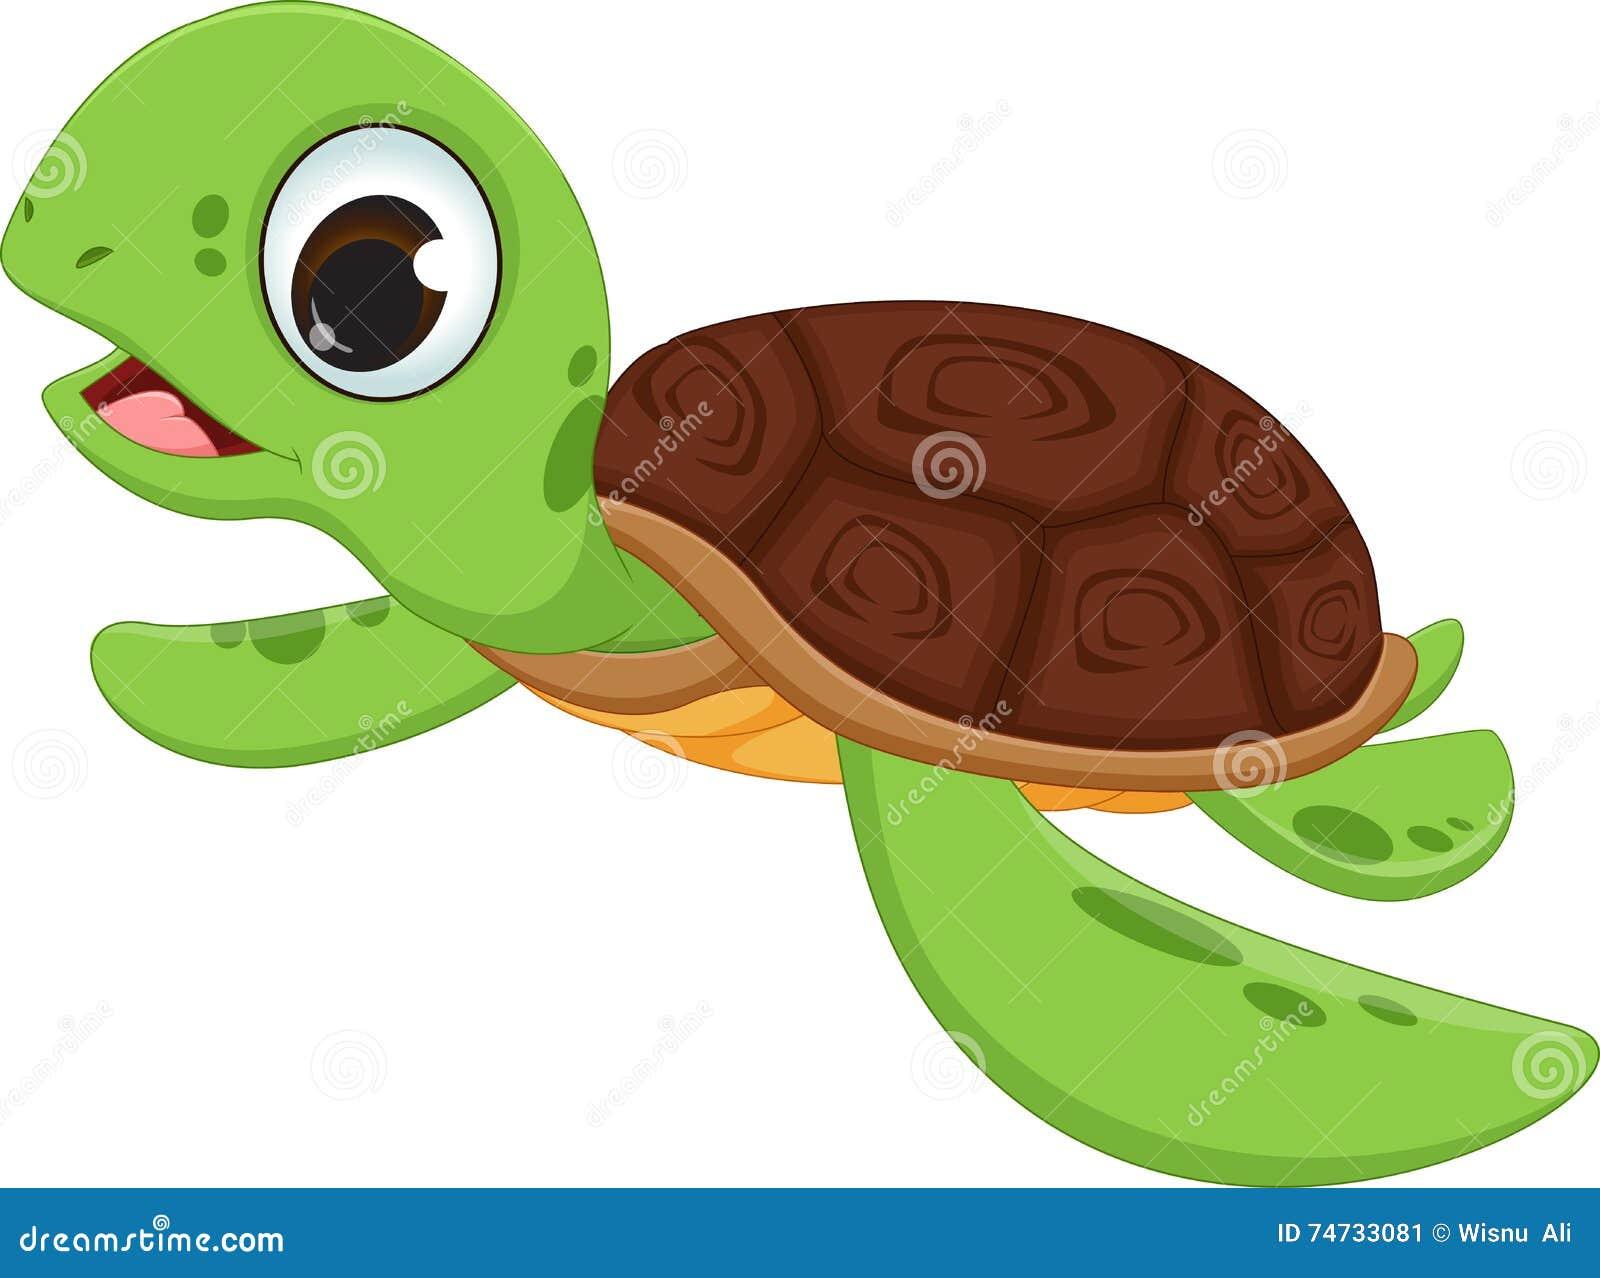 Cute Turtle Cartoon Stock Vector Illustration Of Amphibian 74733081